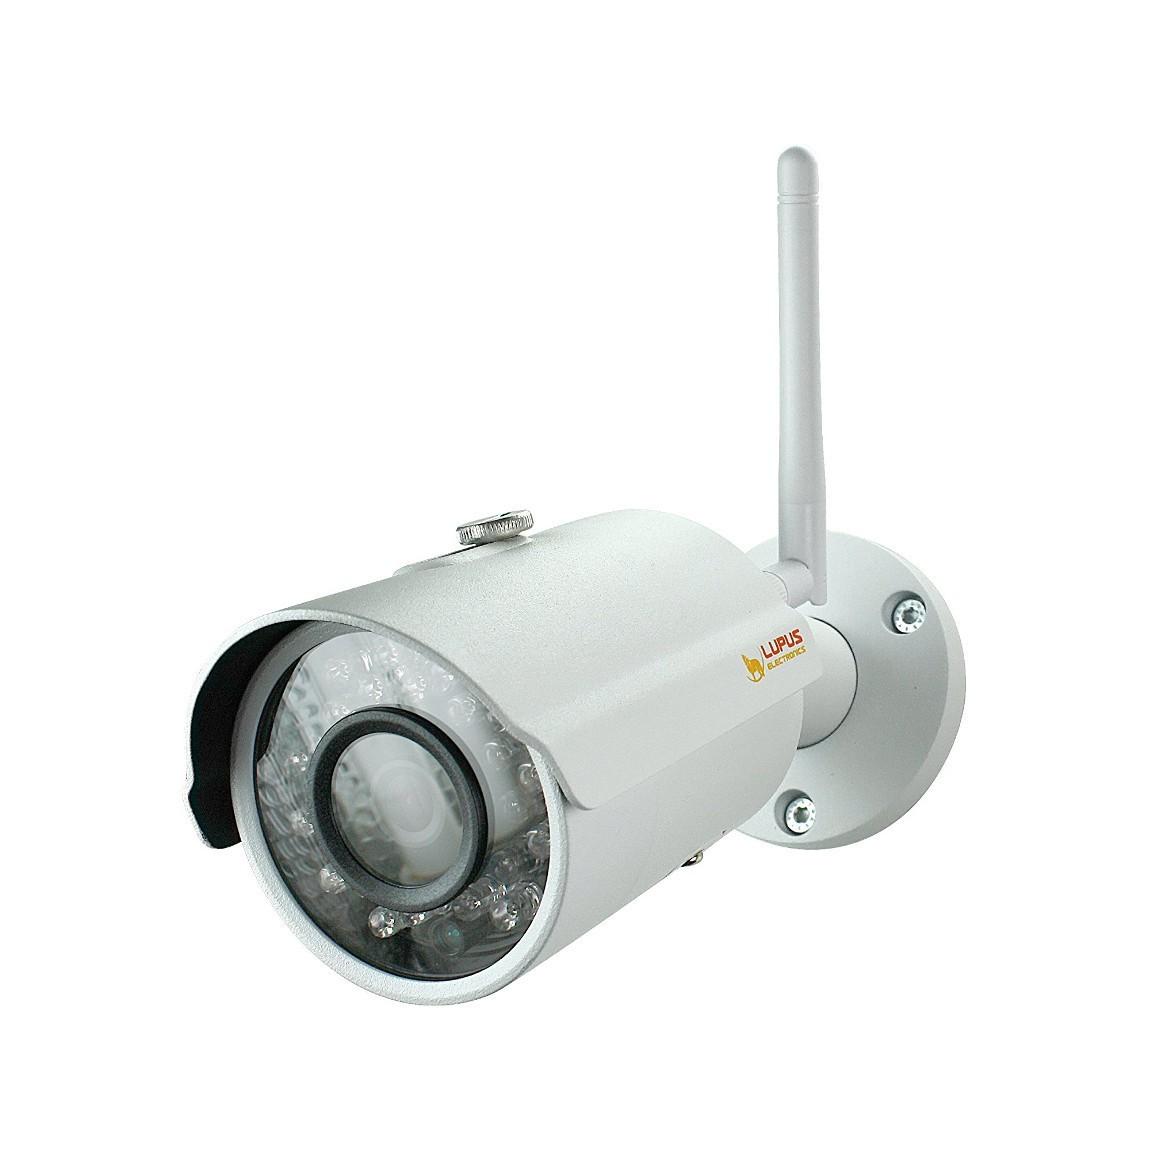 LUPUSNET HD LE201 Außenkamera